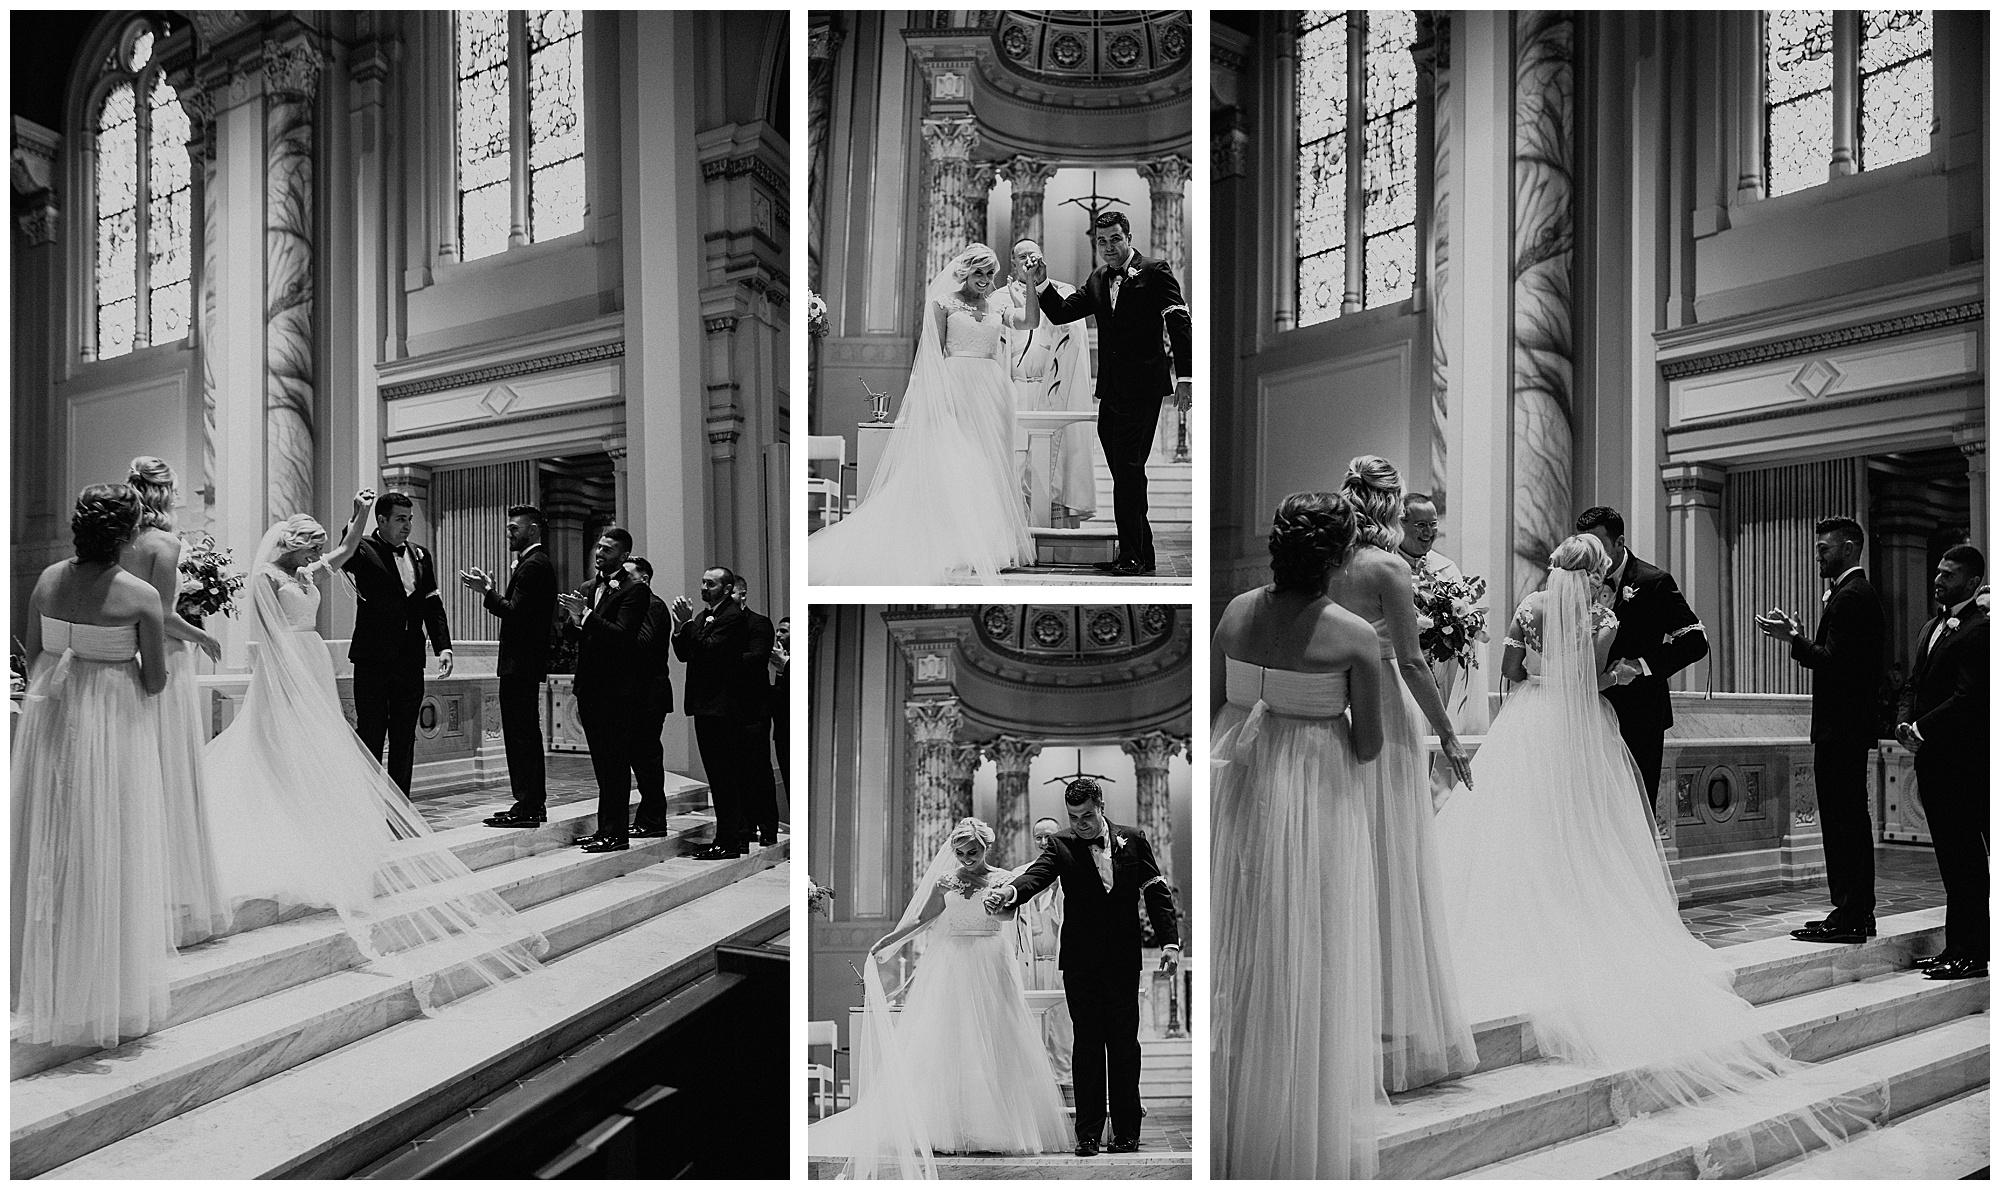 pear_tree_estate_wedding_champaign_il_wright_photographs_jj_0020.jpg